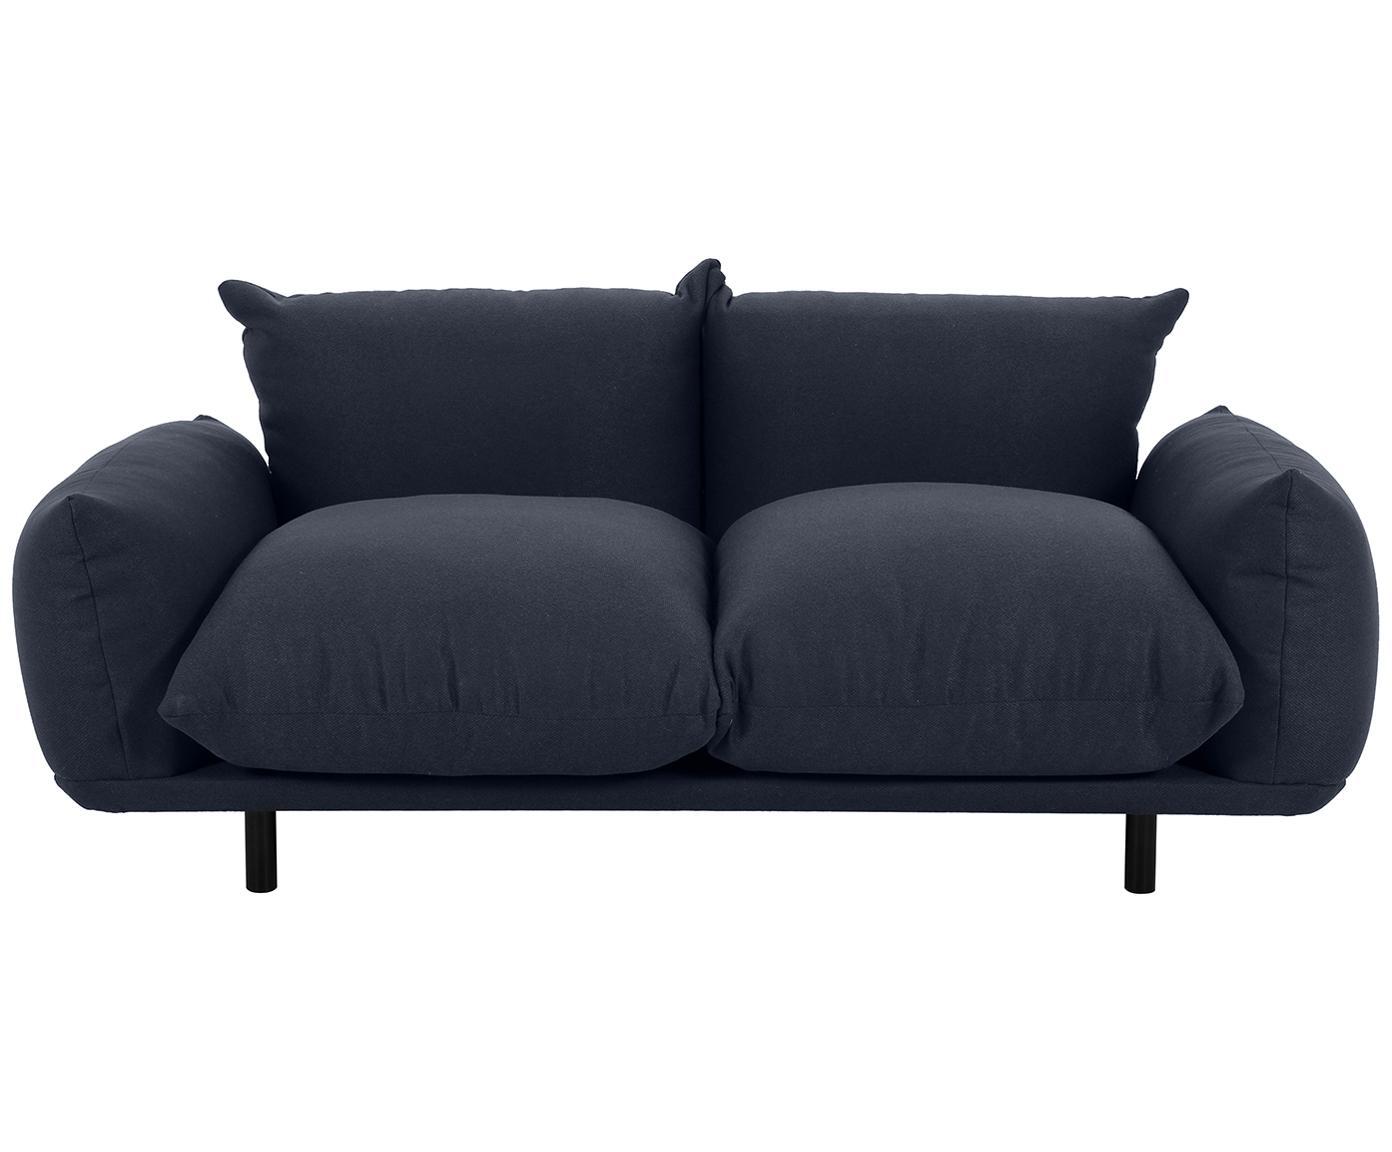 Sofa Saga (2-Sitzer), Bezug: 100% Polyester 35.000 Sch, Gestell: Massives Birkenholz, Füße: Metall, pulverbeschichtet, Webstoff Dunkelblau, B 170 x T 103 cm